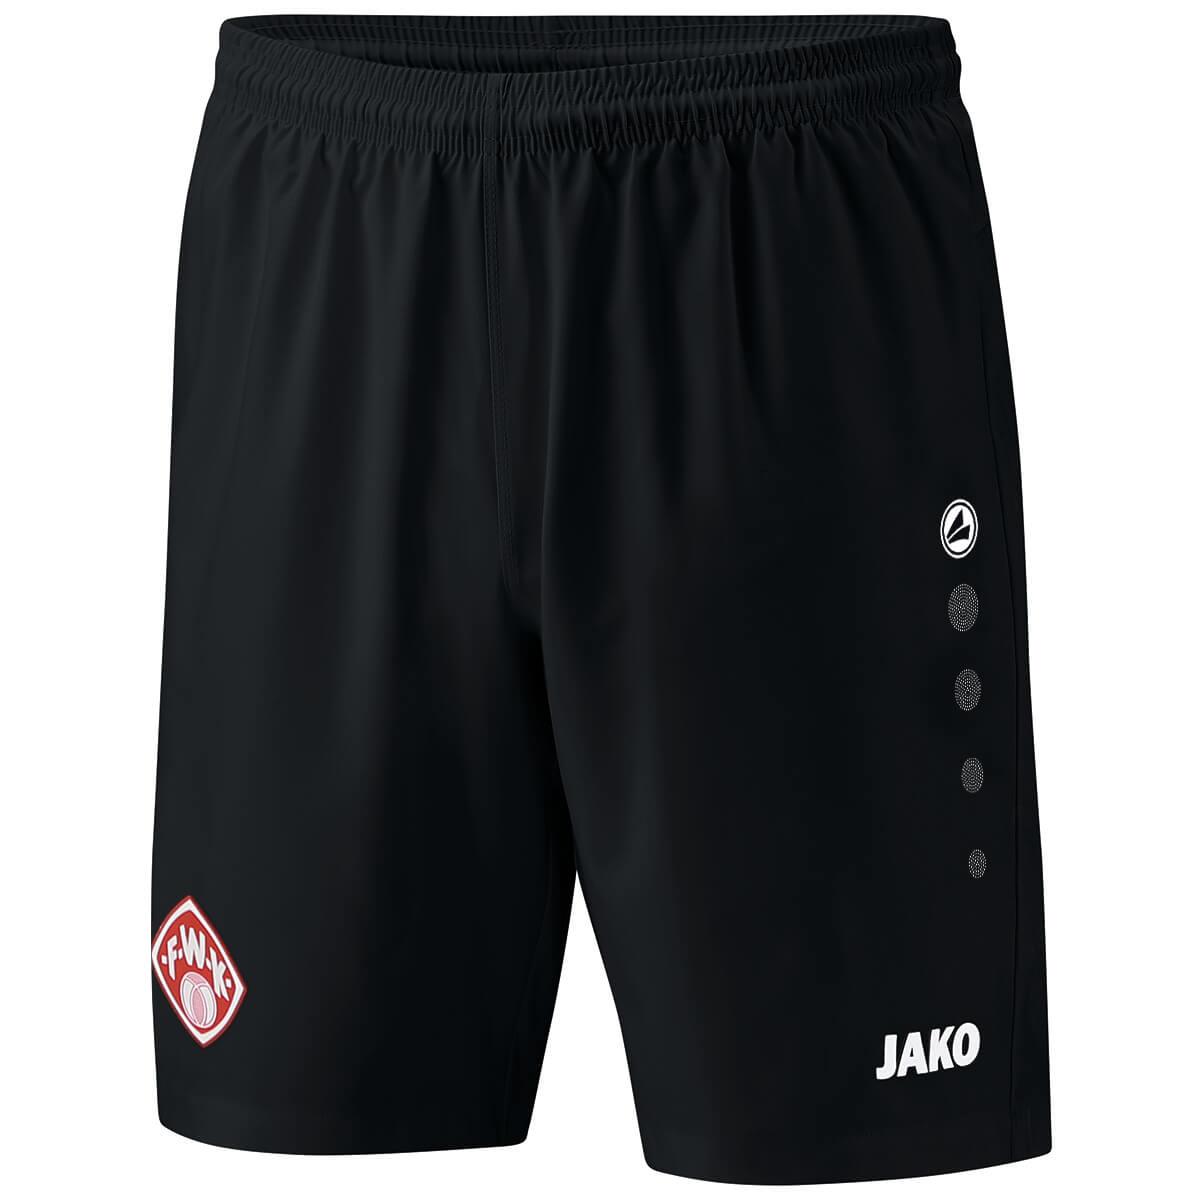 Würzburger Kickers Ausweich Short - Herren | Jako WK4417I